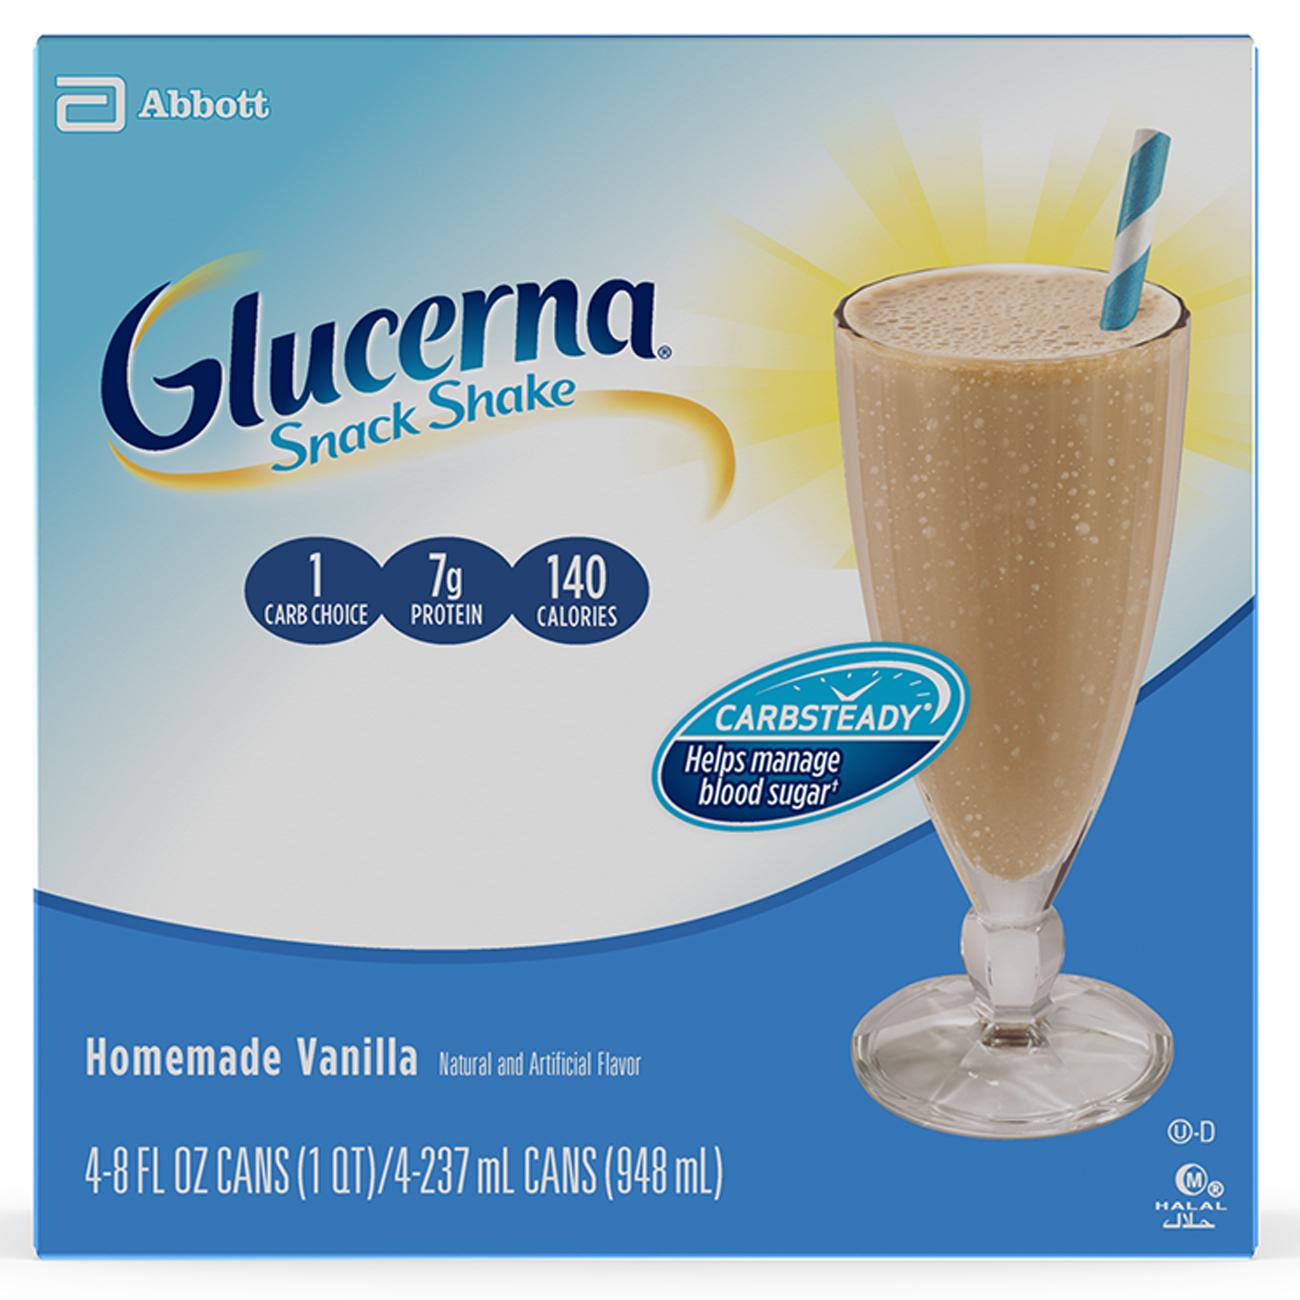 Glucerna Snack Shake, To Help Manage Blood Sugar, Homemade Vanilla, 8 Oz, 4 Ct